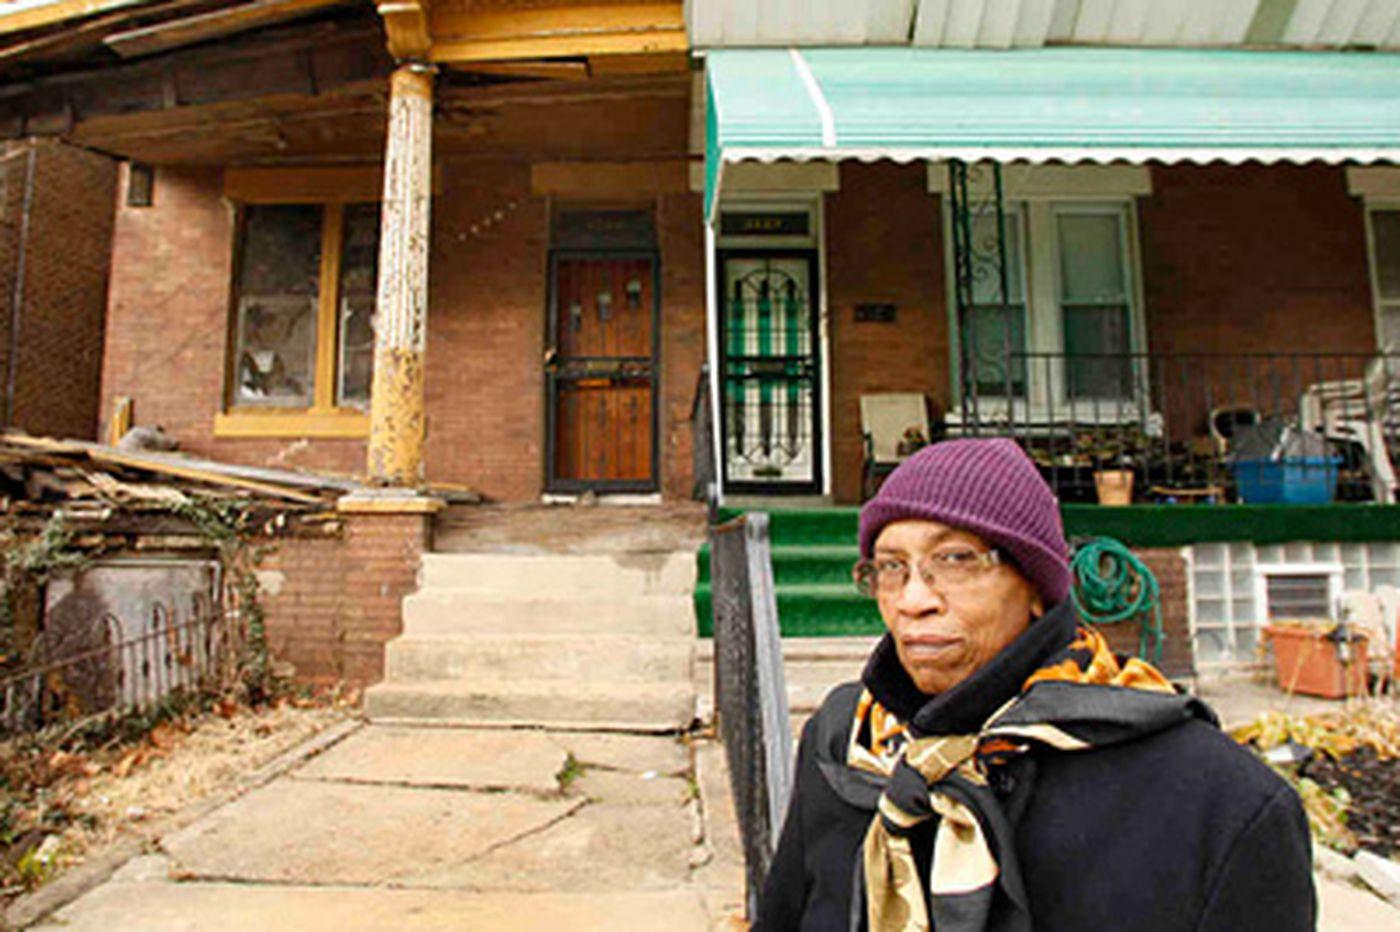 City Howl Help Desk: Philadelphia Daily News City Howl helps bring down a house